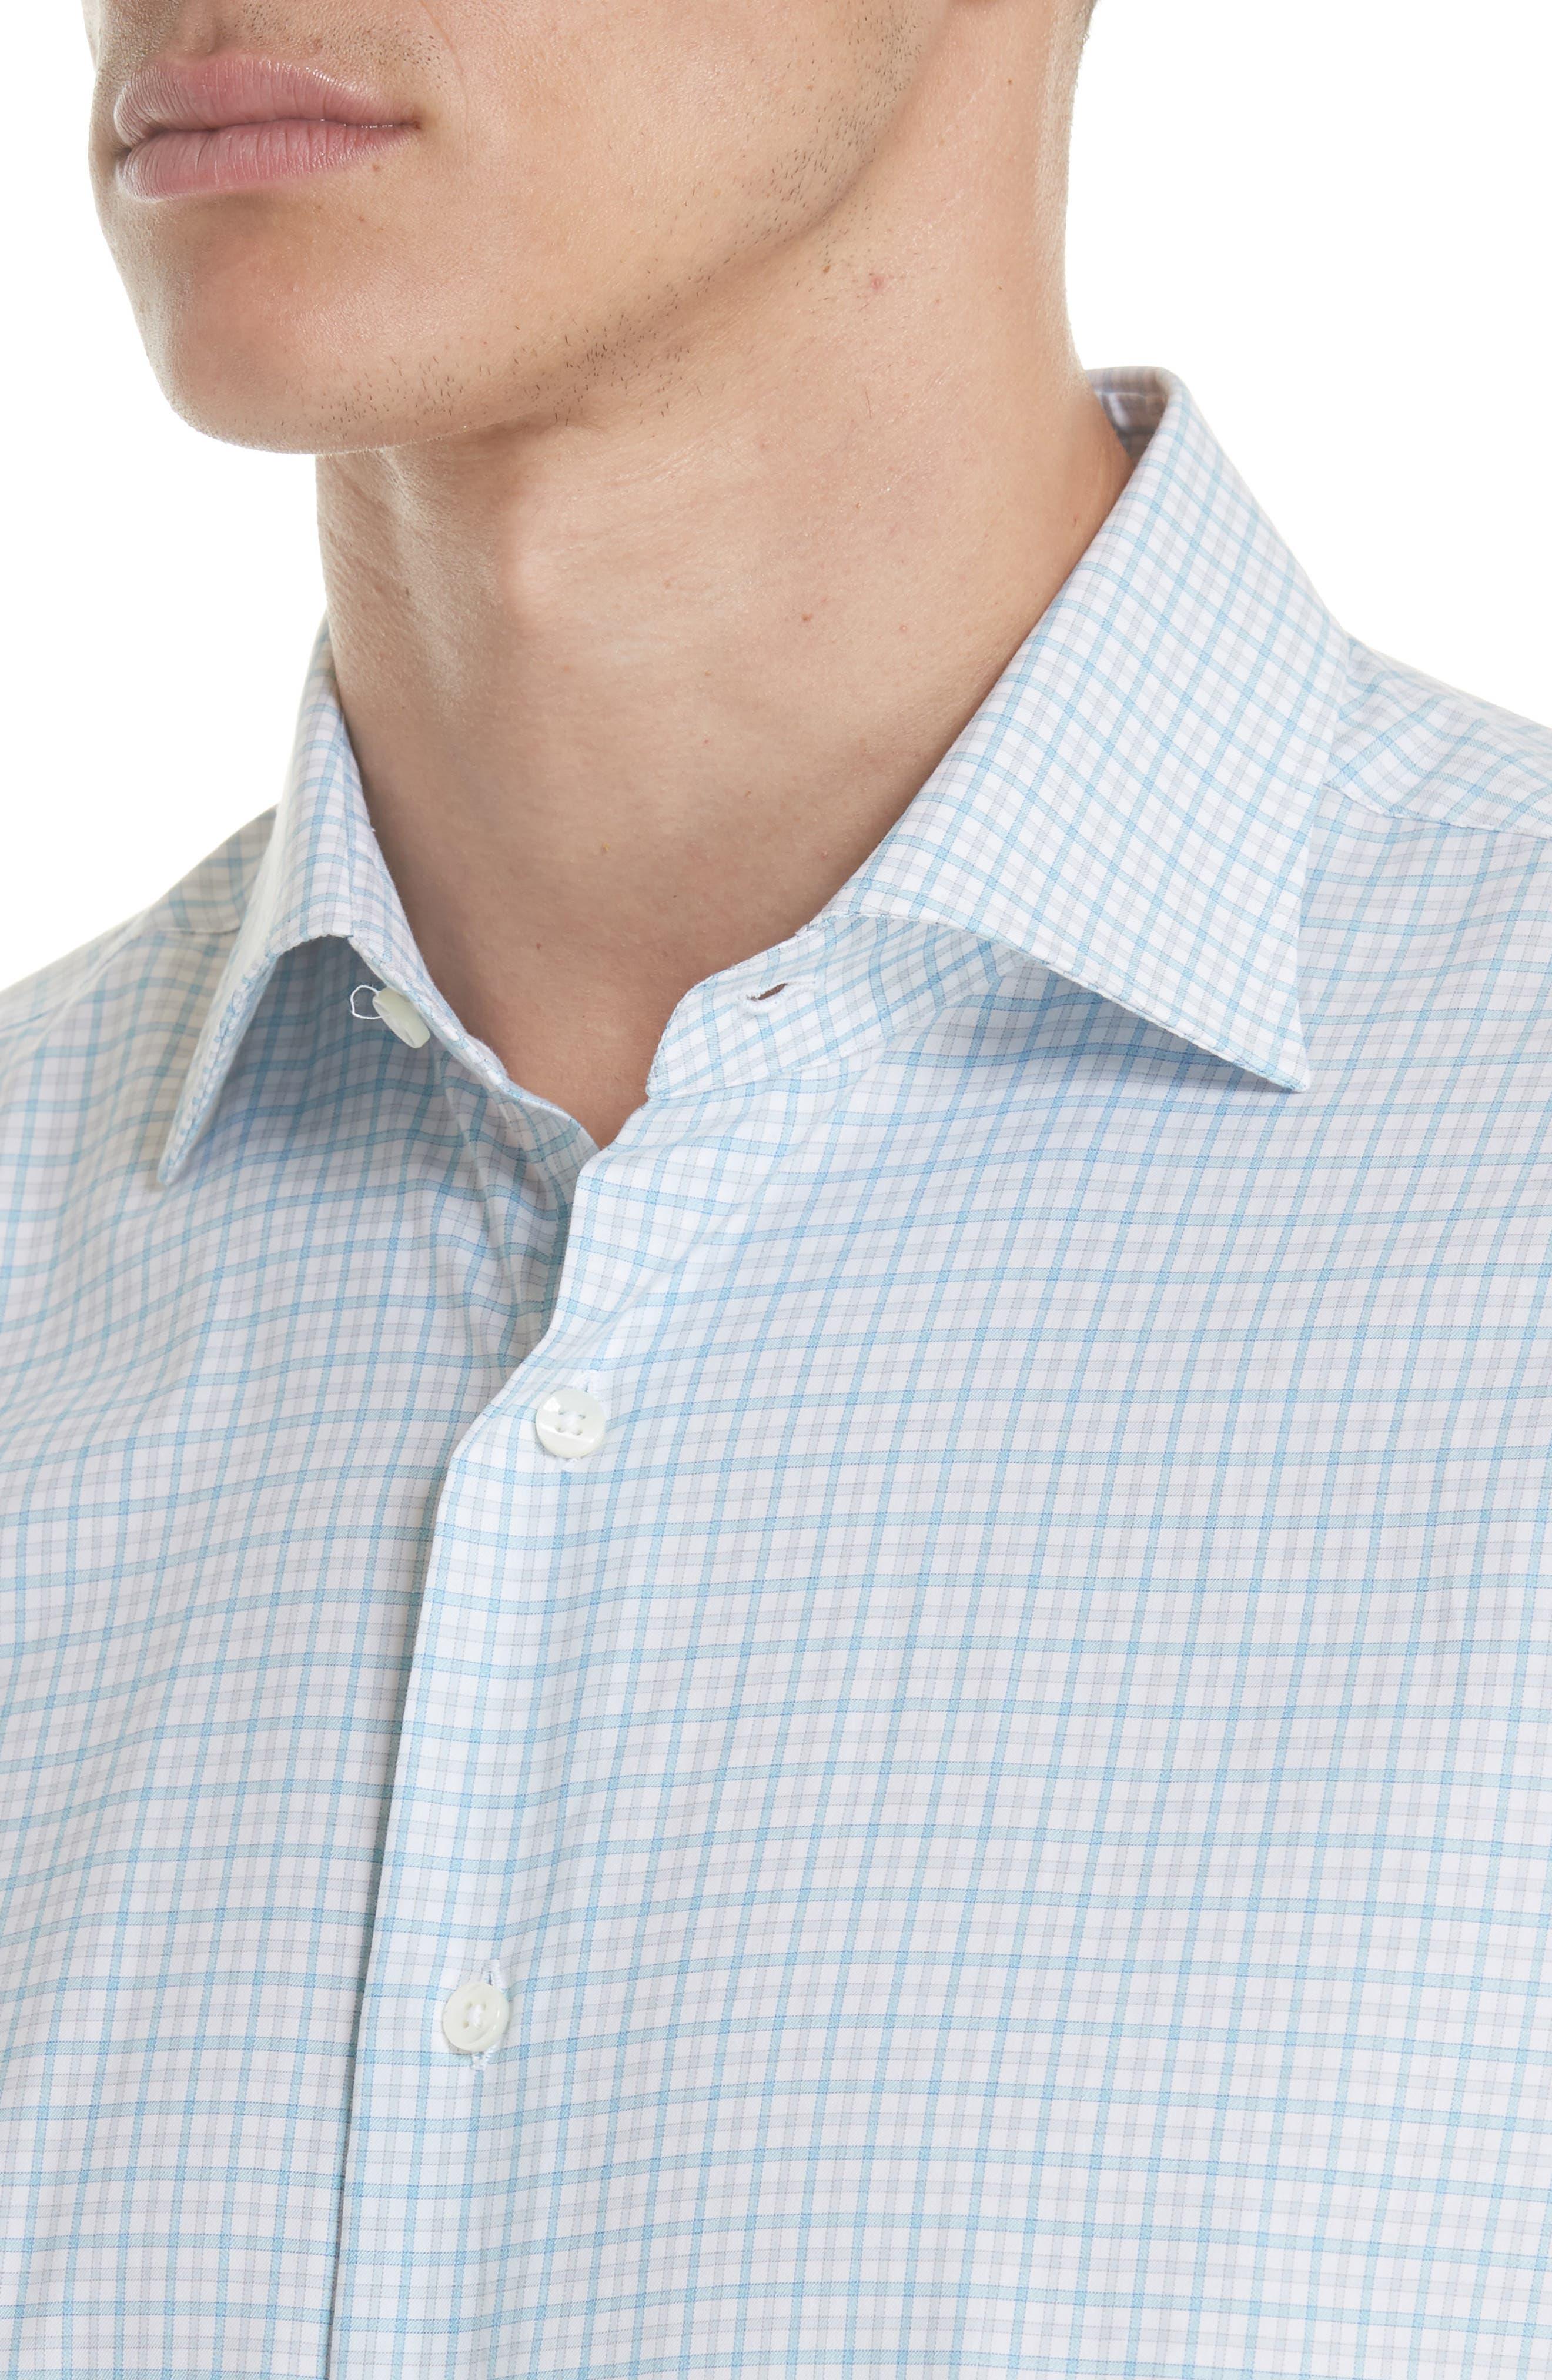 Regular Fit Check Dress Shirt,                             Alternate thumbnail 2, color,                             440